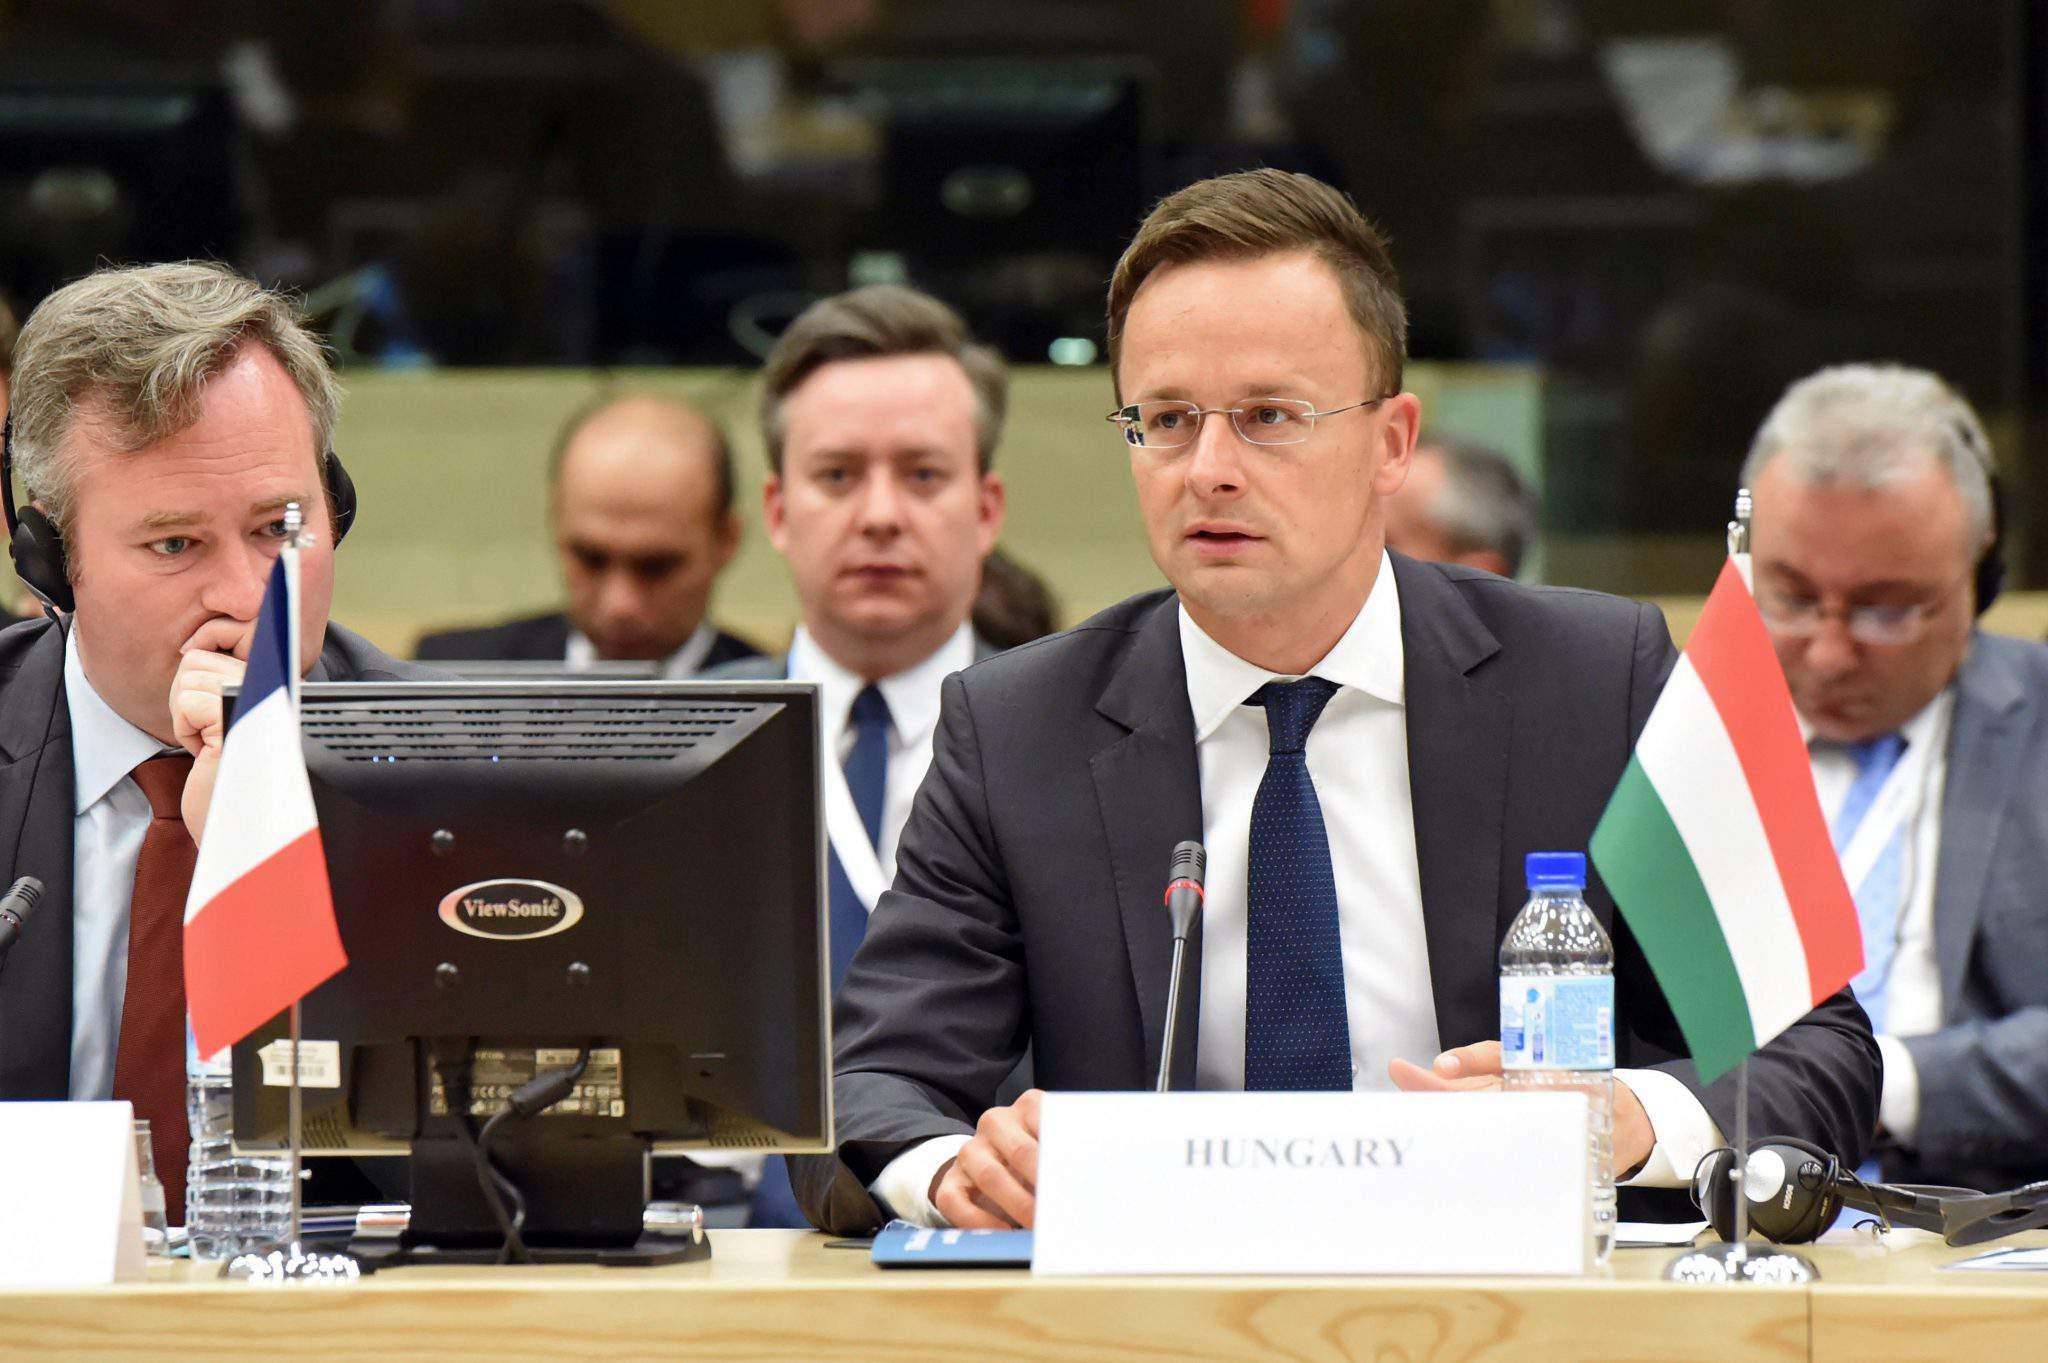 Hungary foreign minister Péter Szijjártó